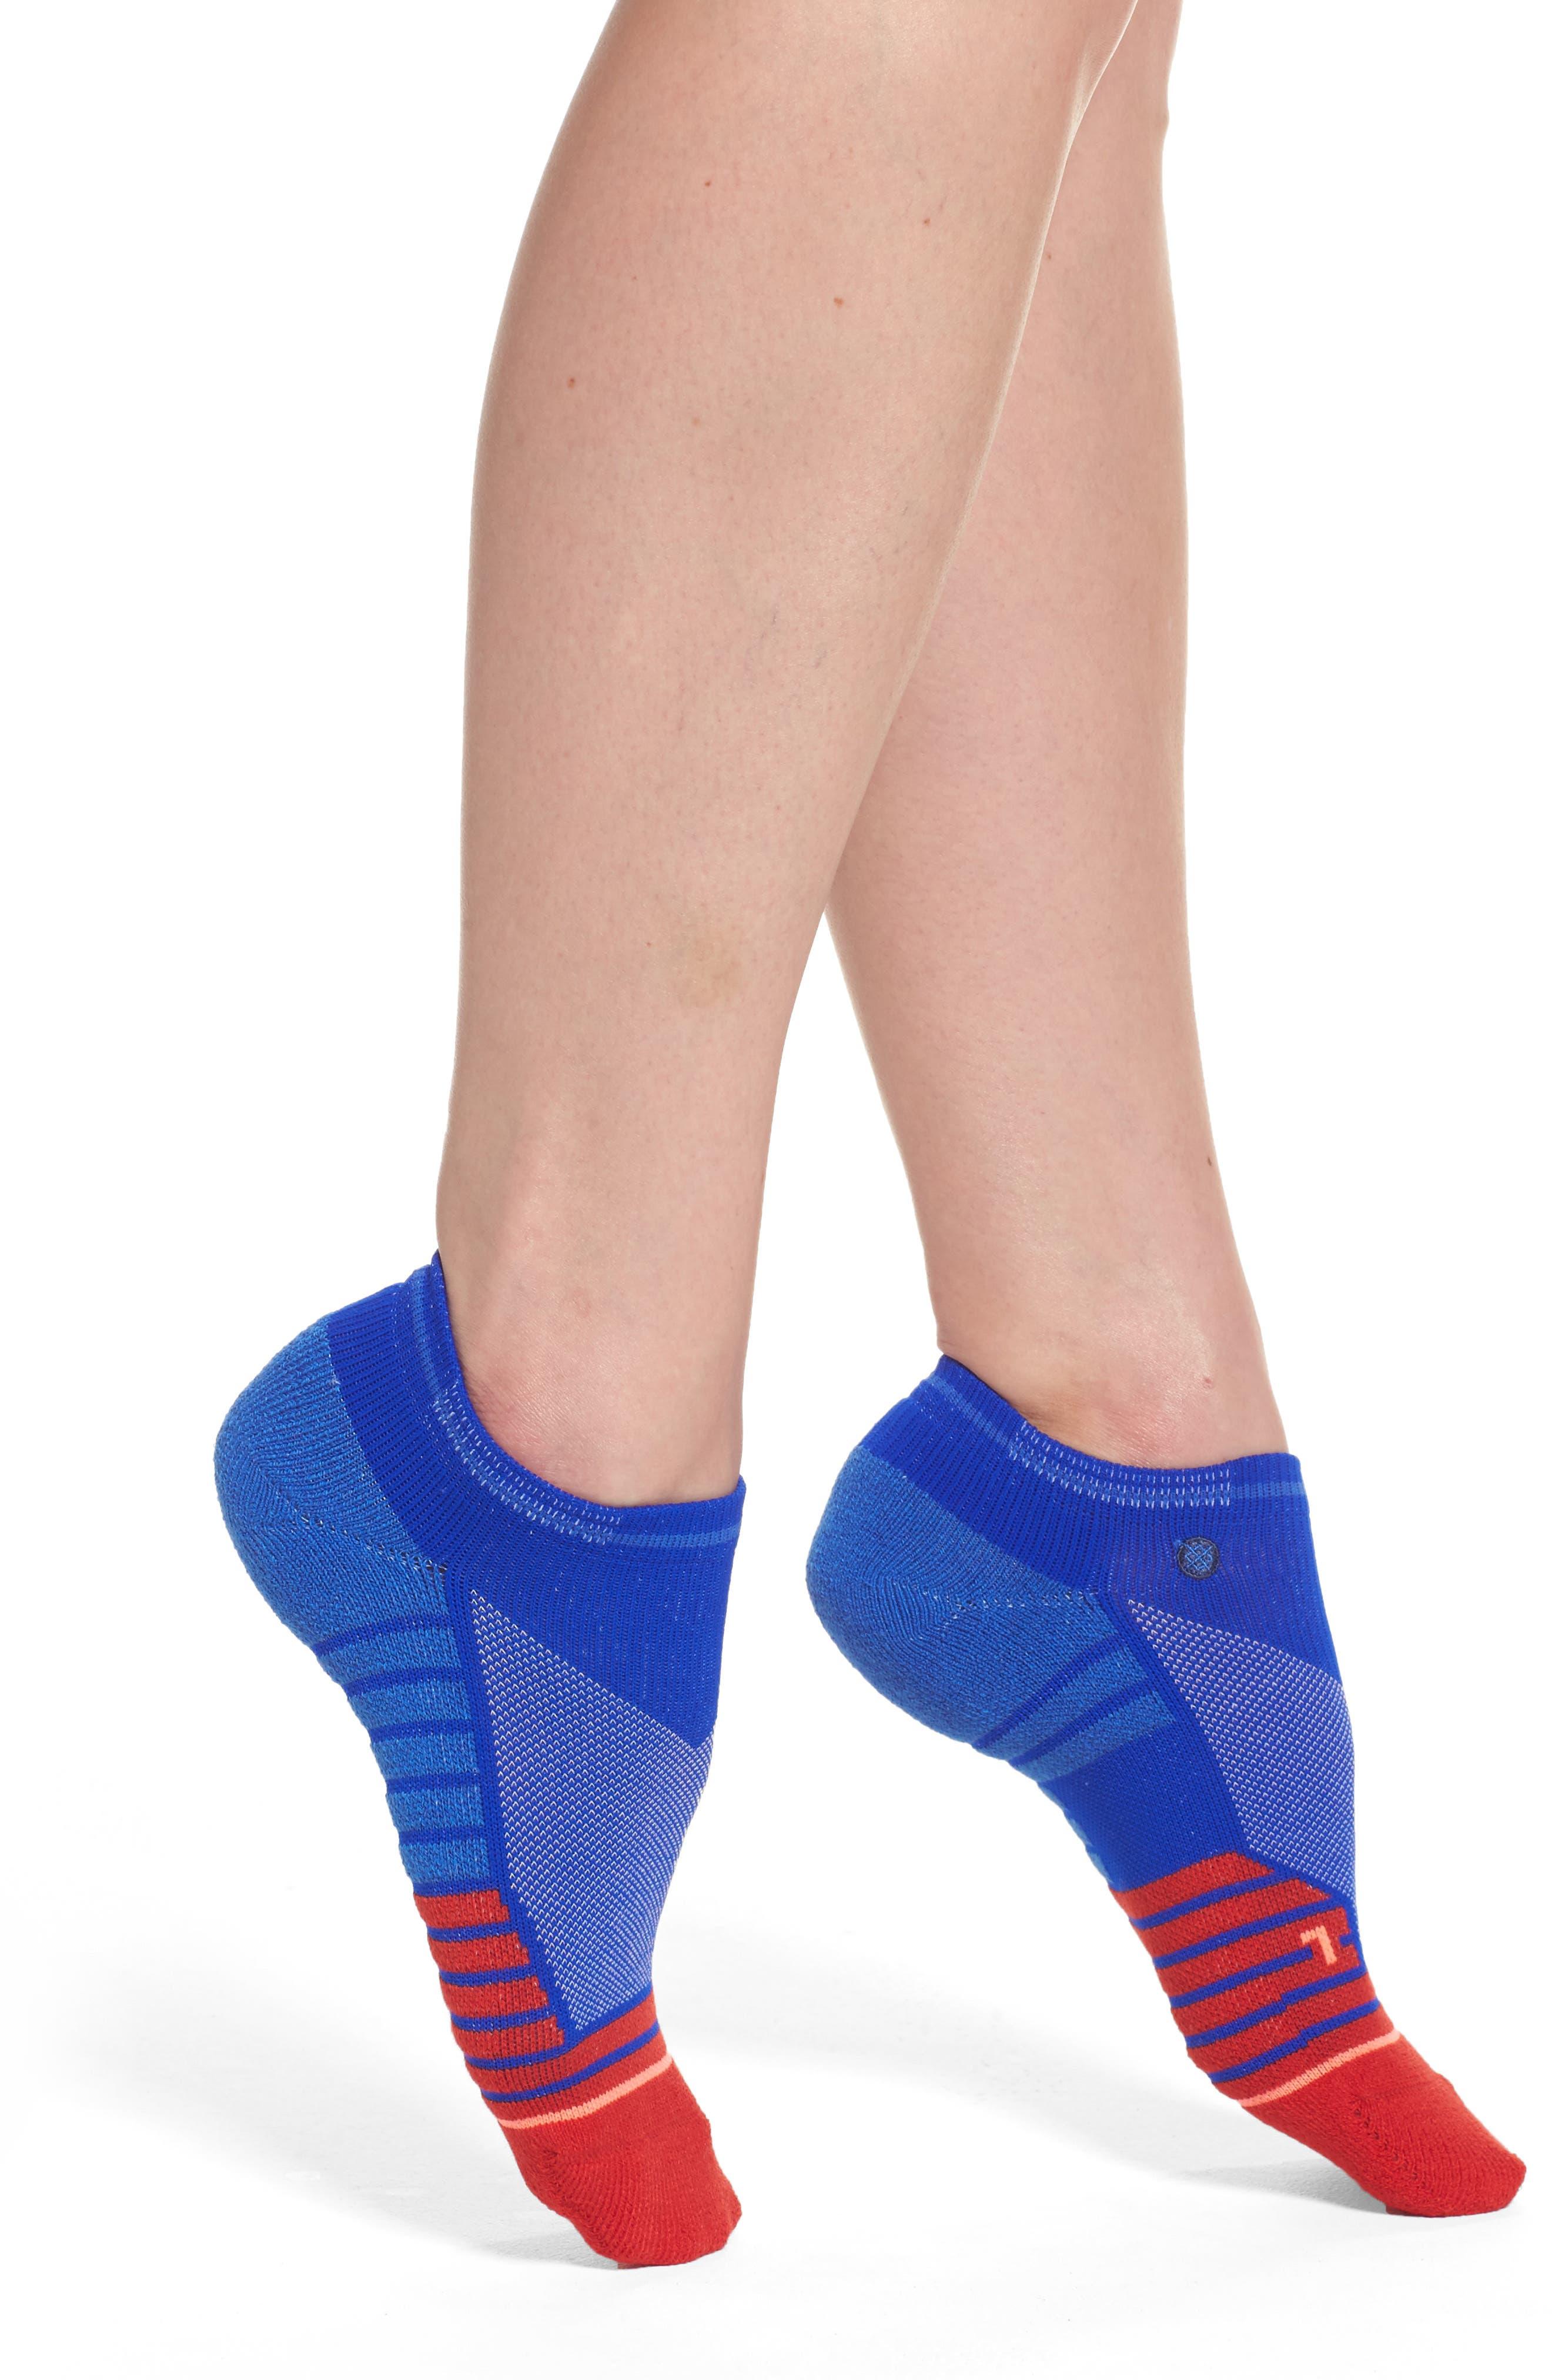 Stance Midnight Gardener Low-Cut Socks